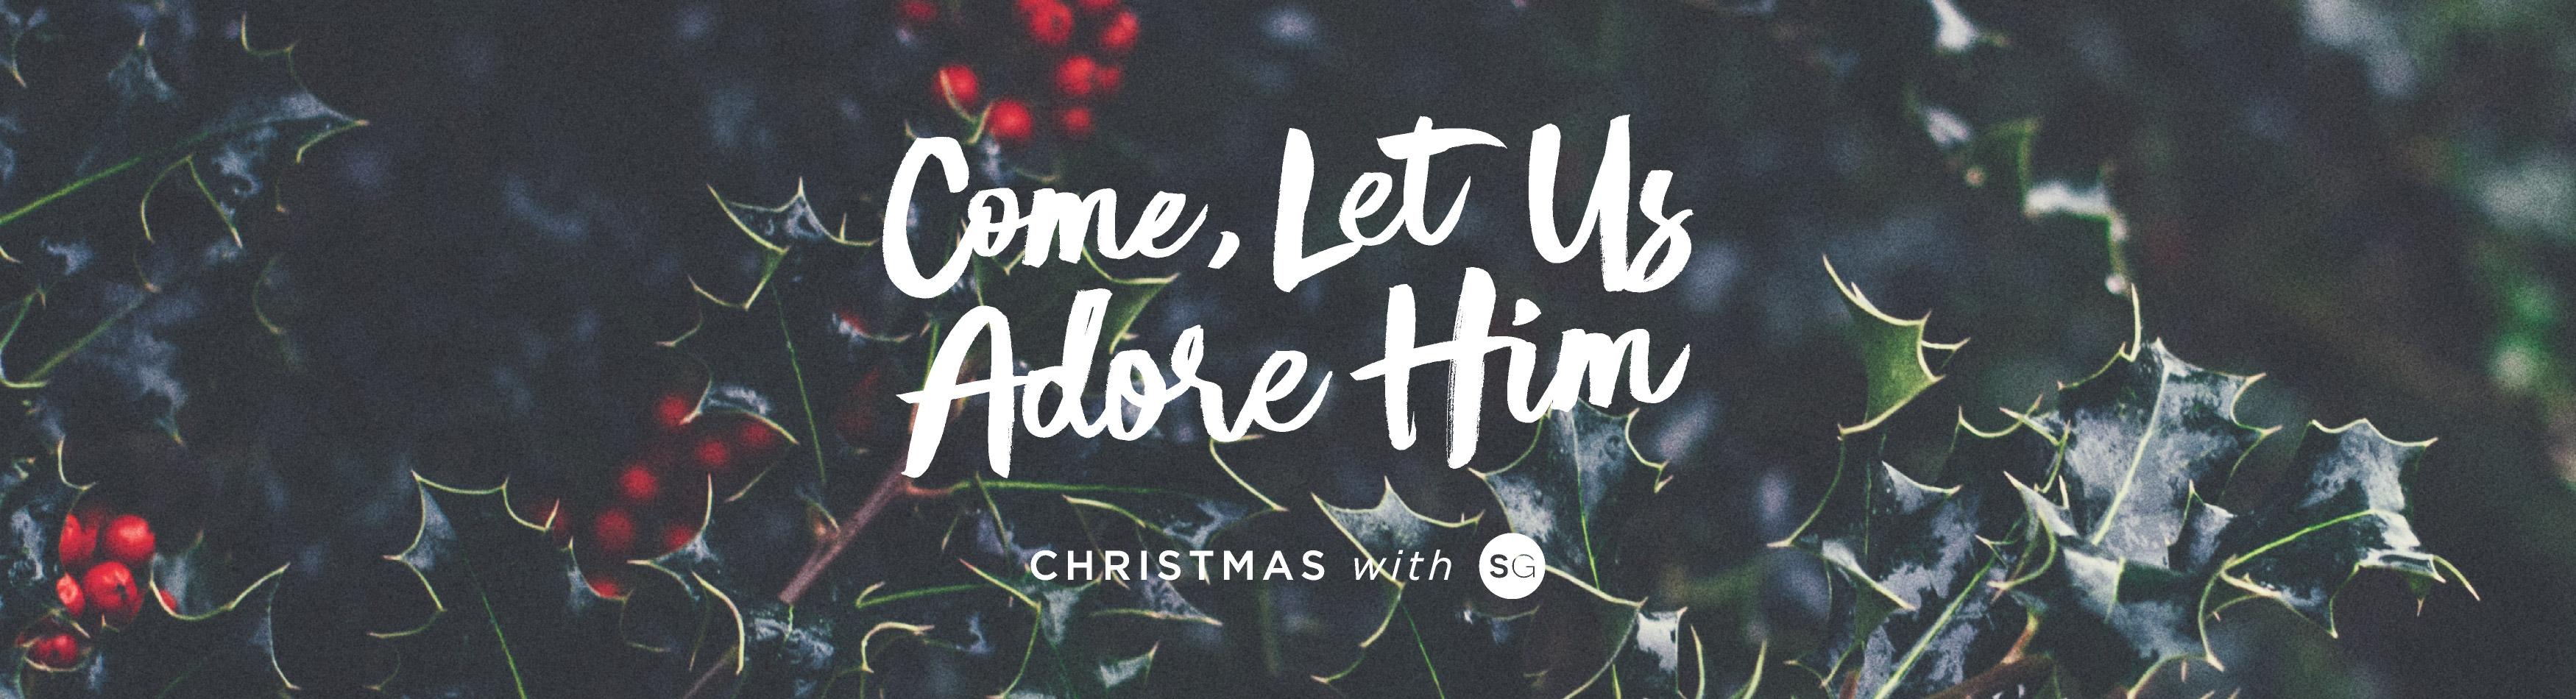 advent-2017_web-banner